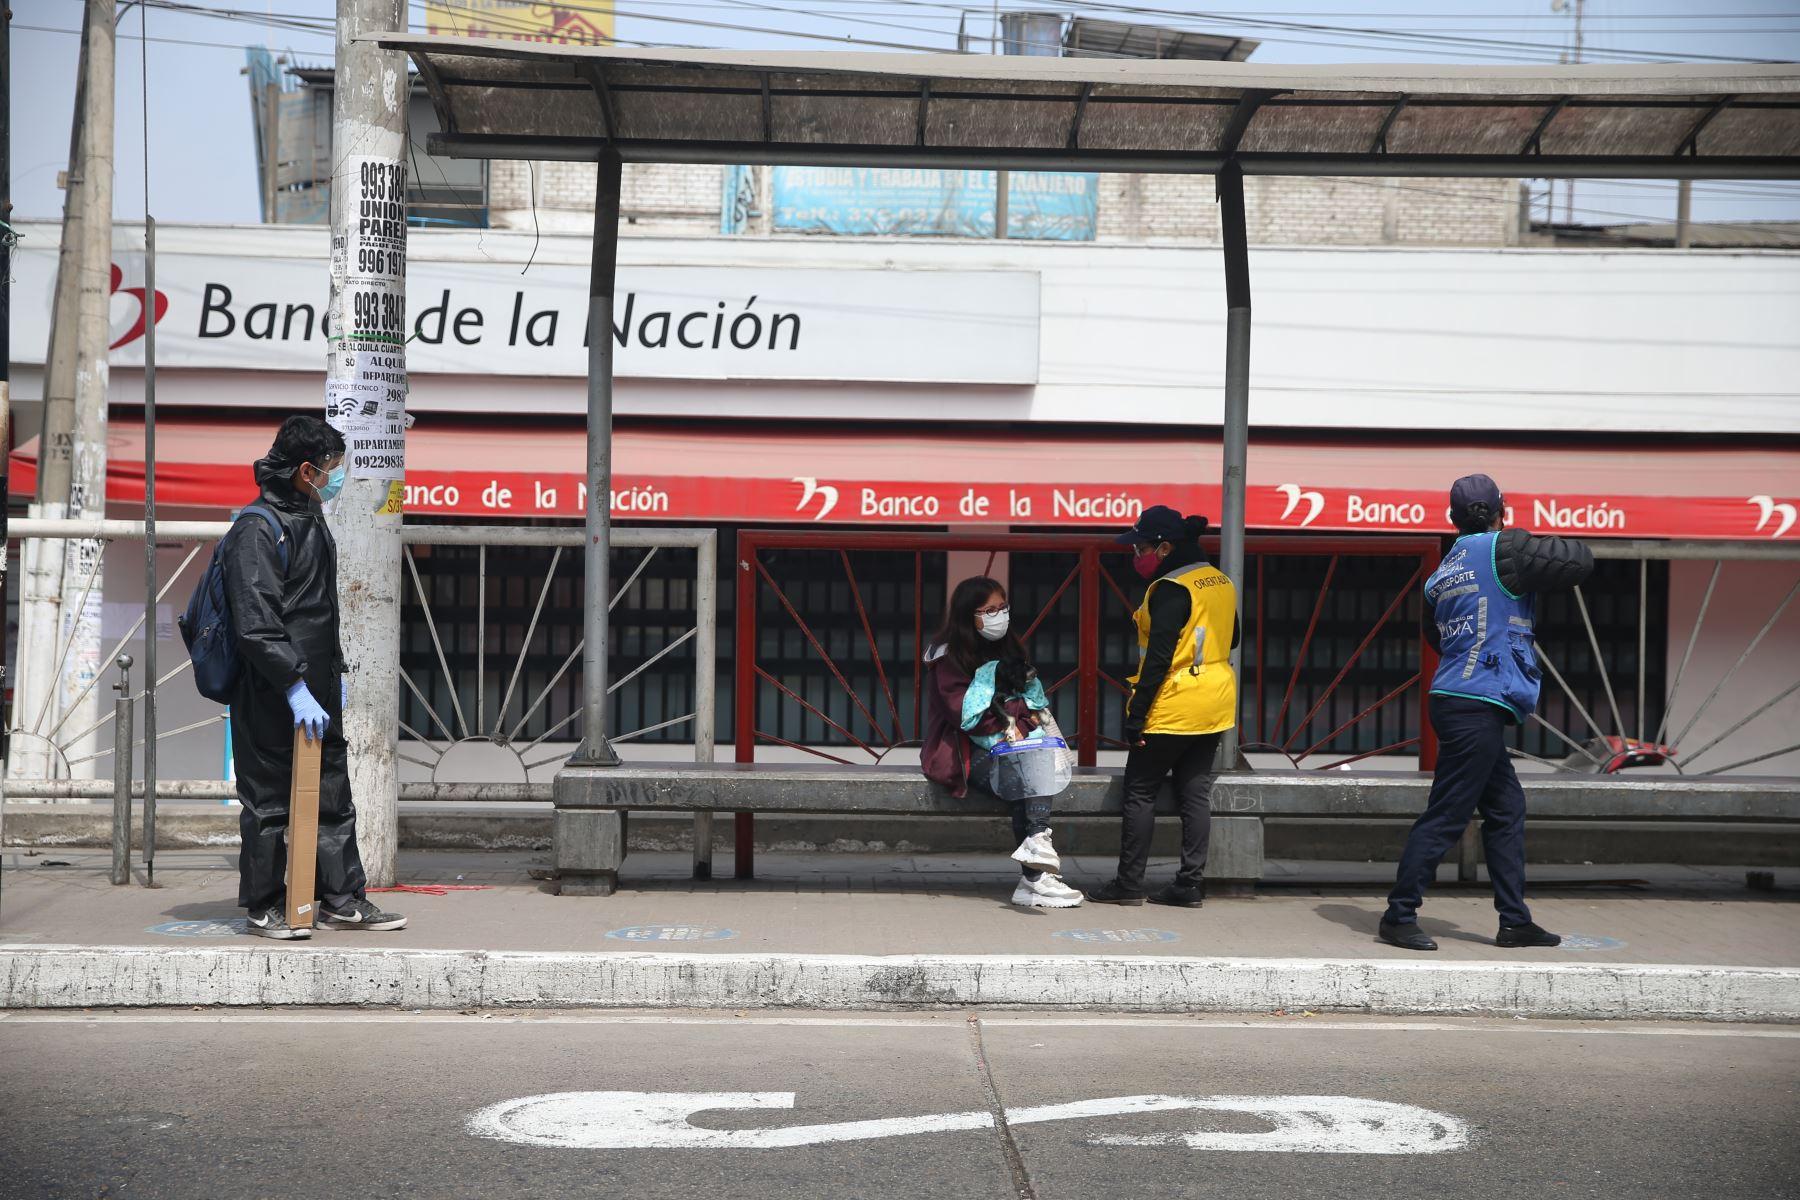 Un grupo de personas espera la llegada de bus en un paradero de San Juan de Lurigancho. Foto: ANDINA/Jhonel Rodríguez